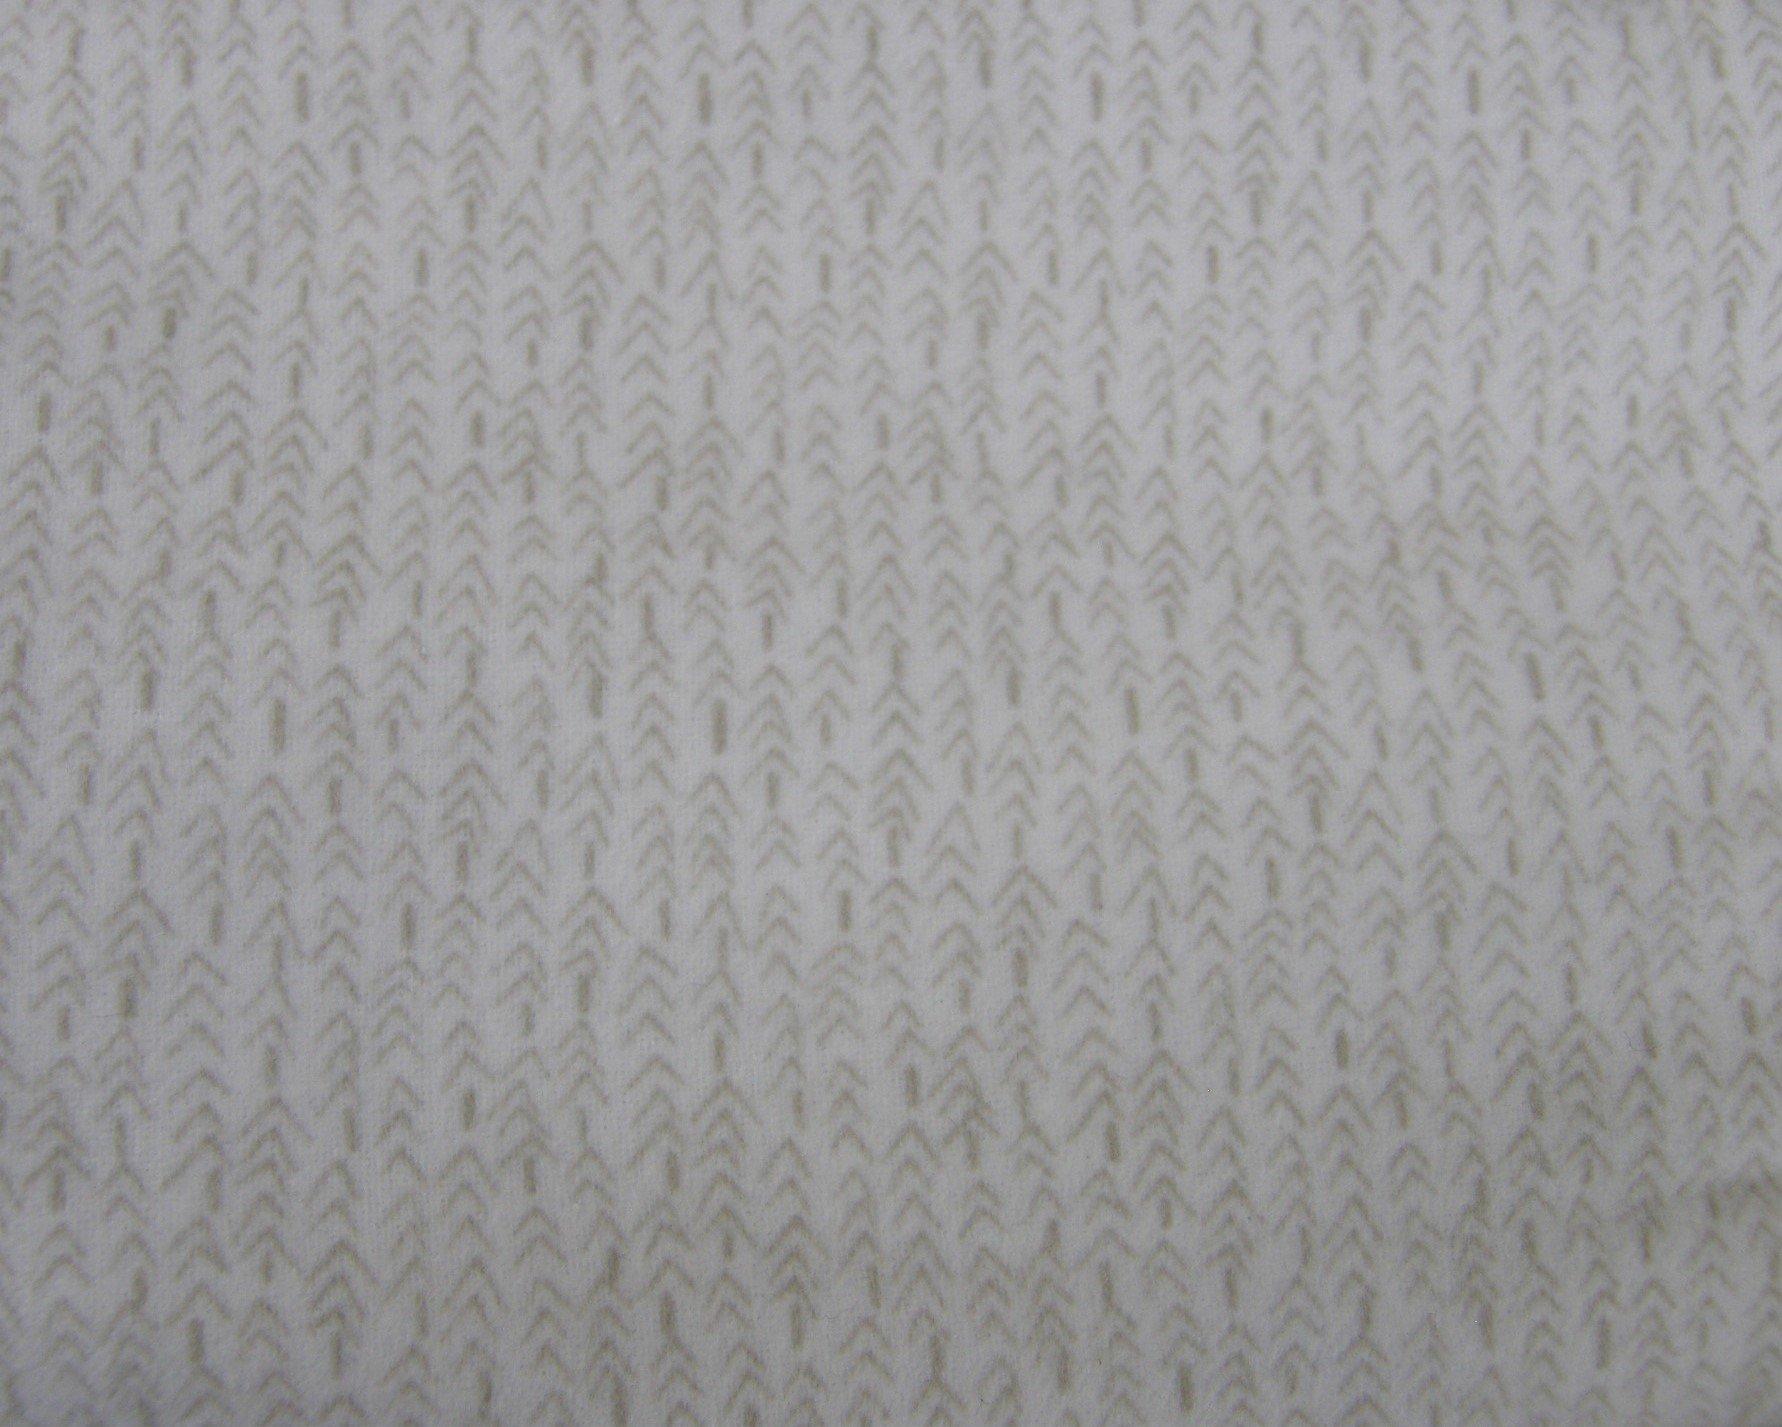 Bolt End Folk Art Flannel Off White Tiny Tree Lines 2/3 yd X WOF